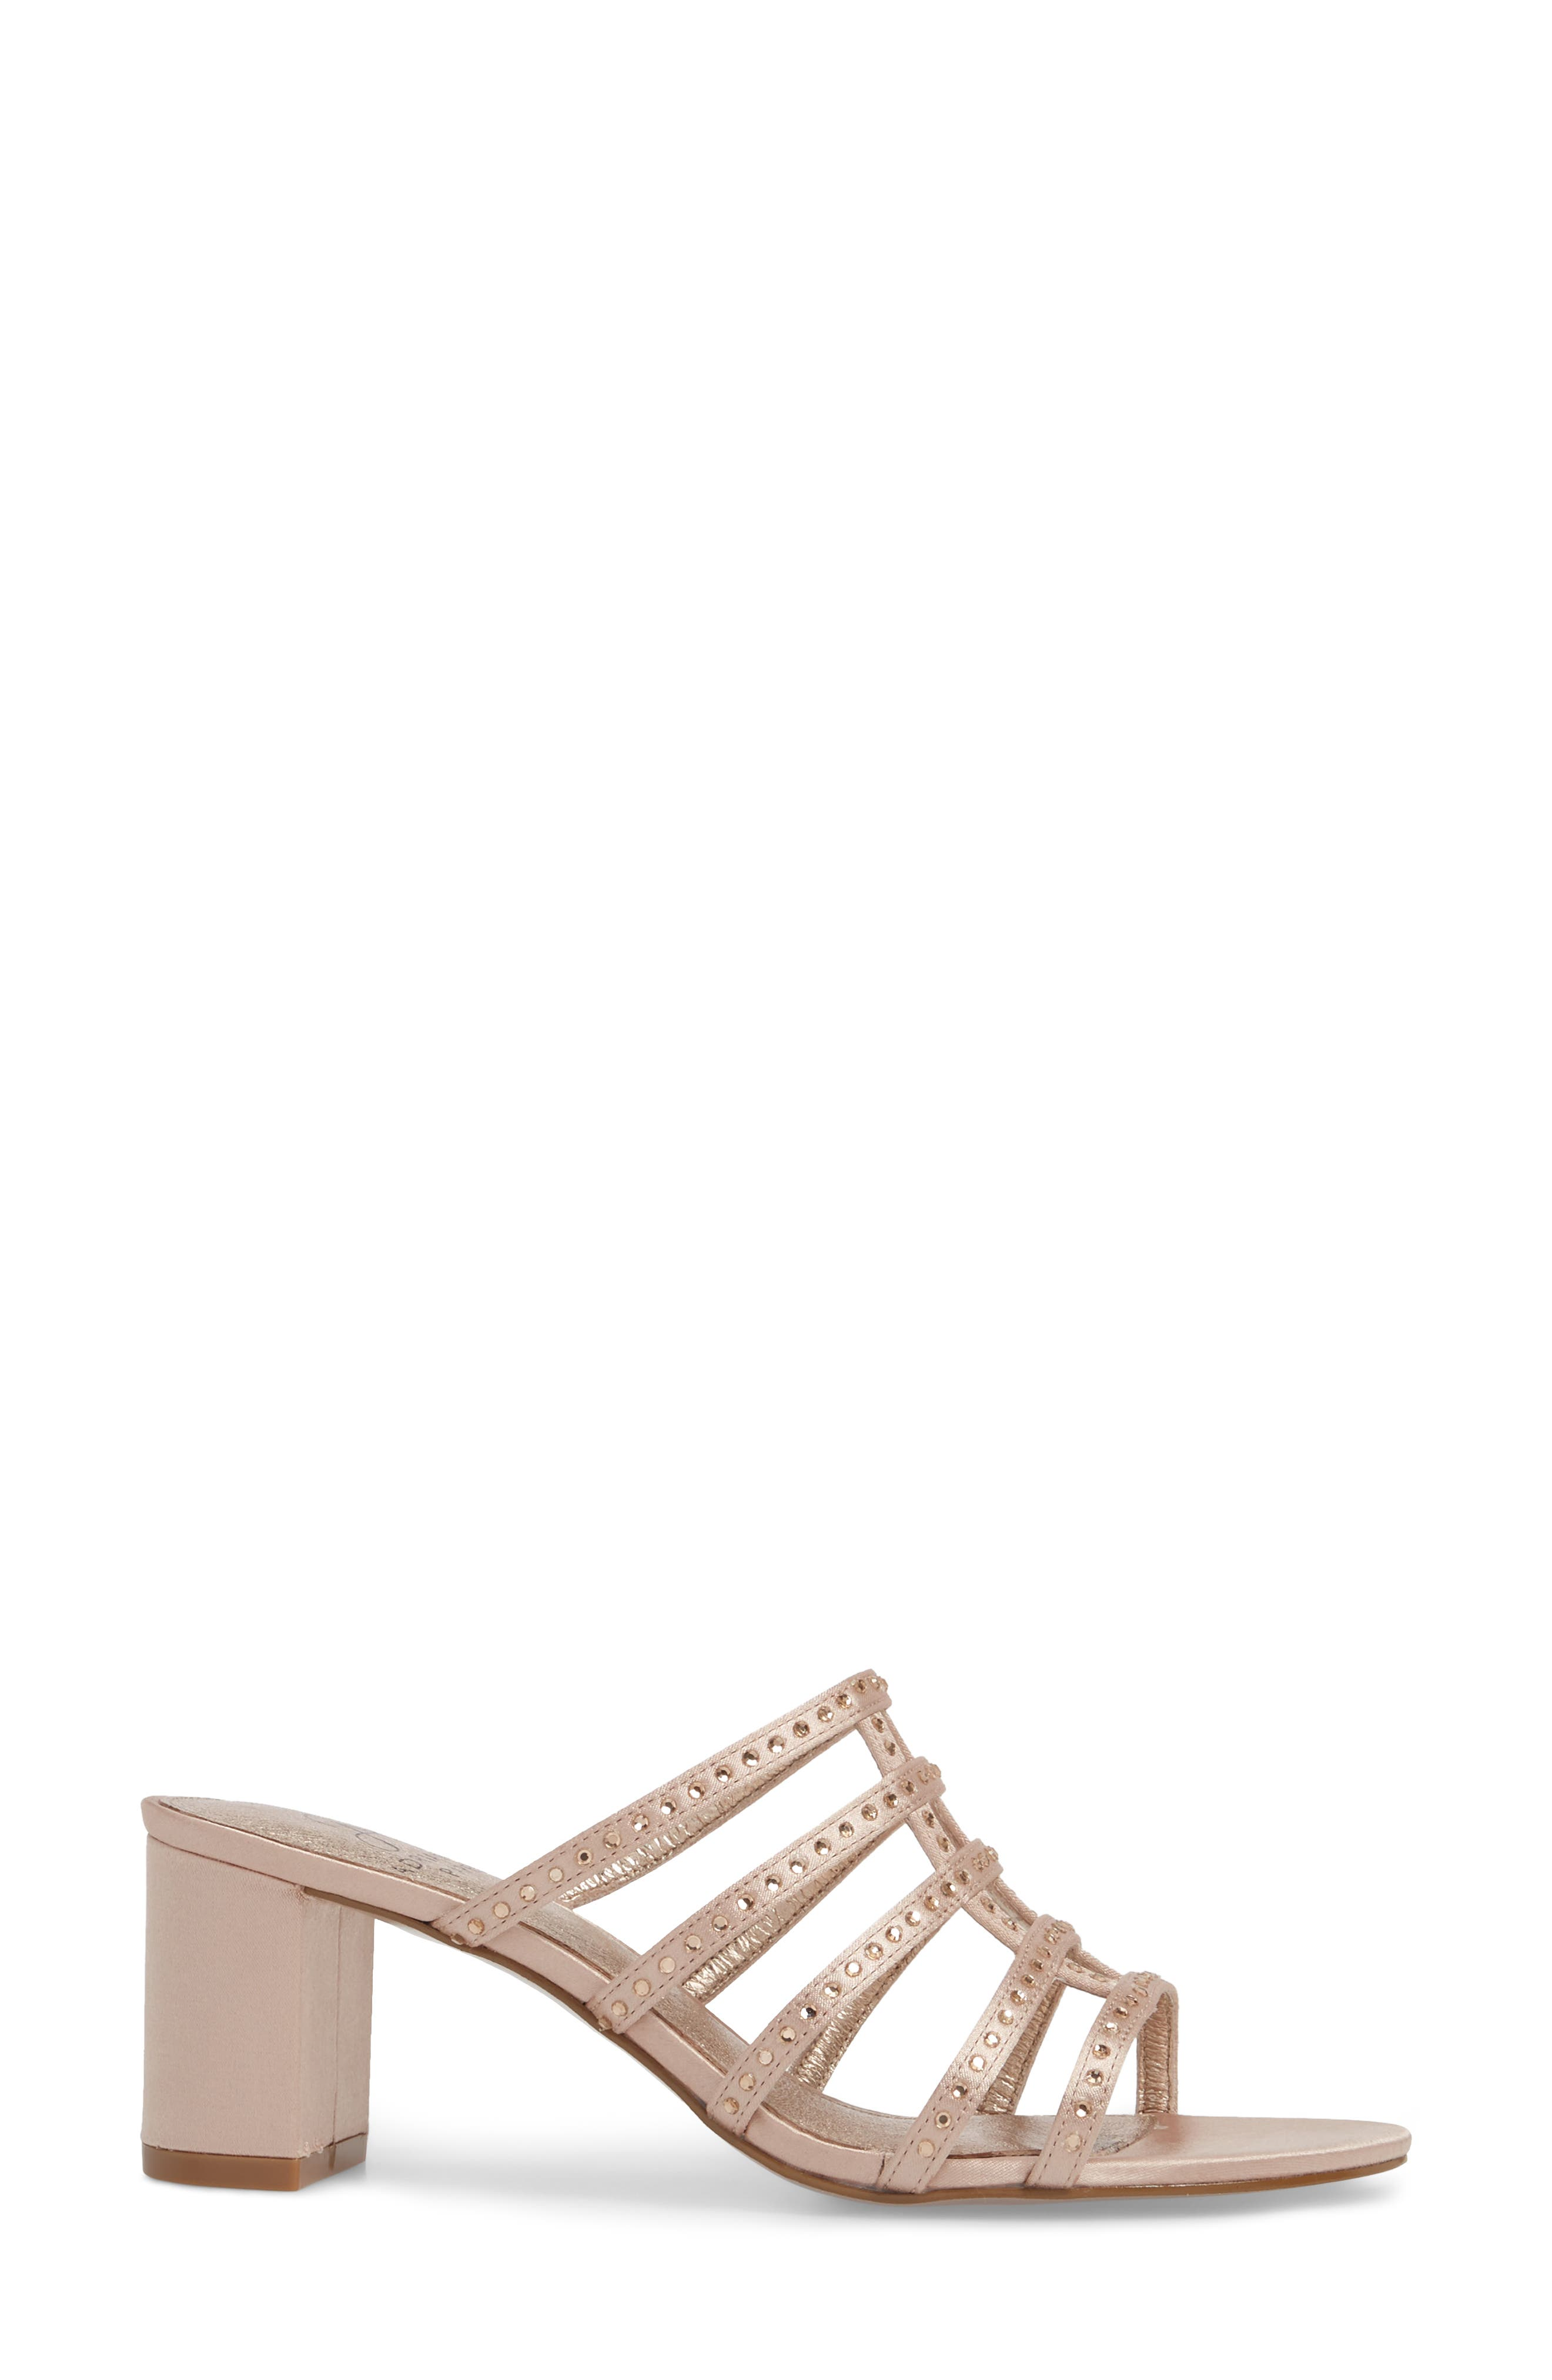 Apollo Block Heel Sandal,                             Alternate thumbnail 3, color,                             Sheer Fabric